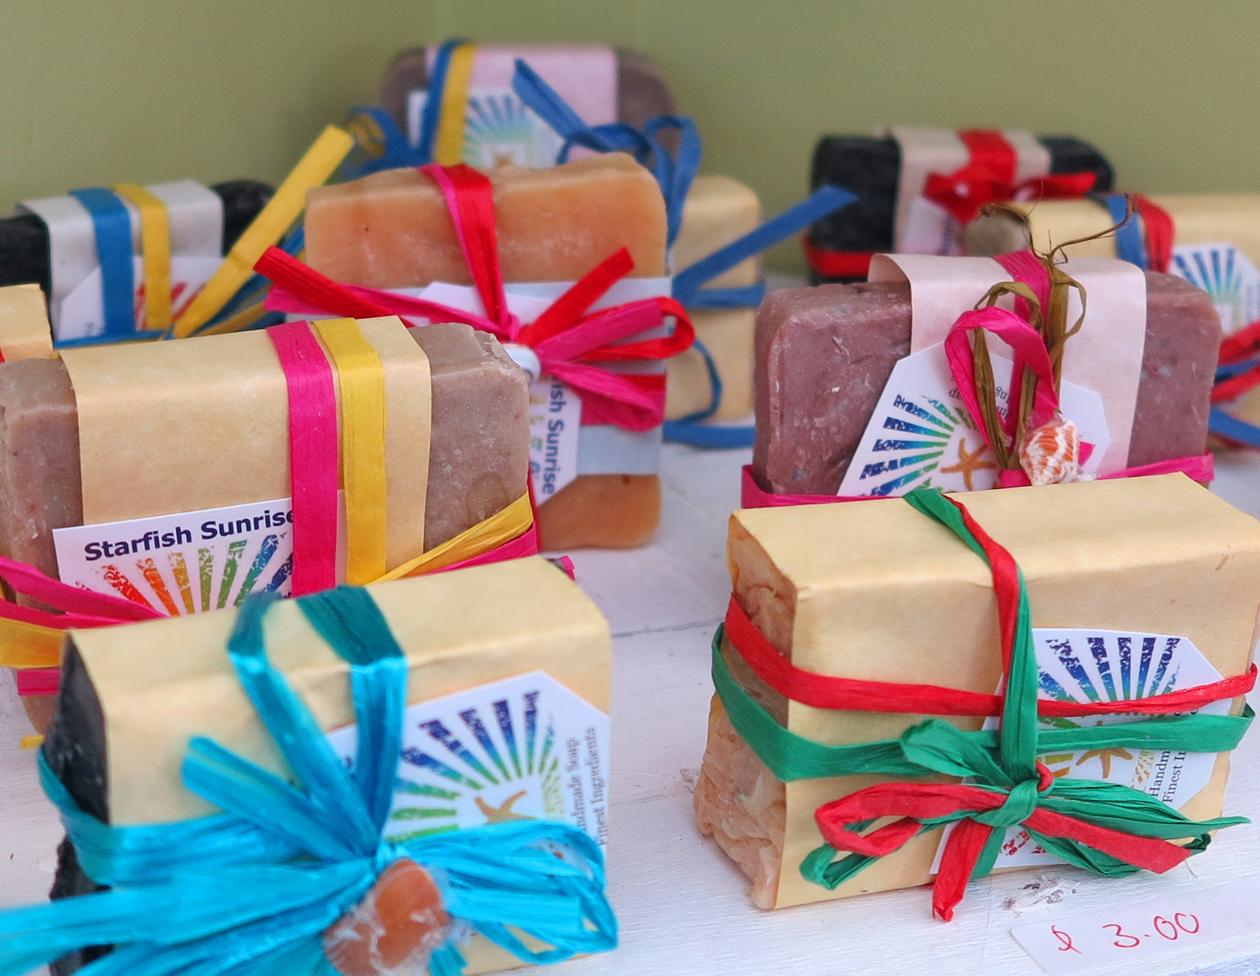 bahamas, abaco, starfish enterprises, every child counts, soap